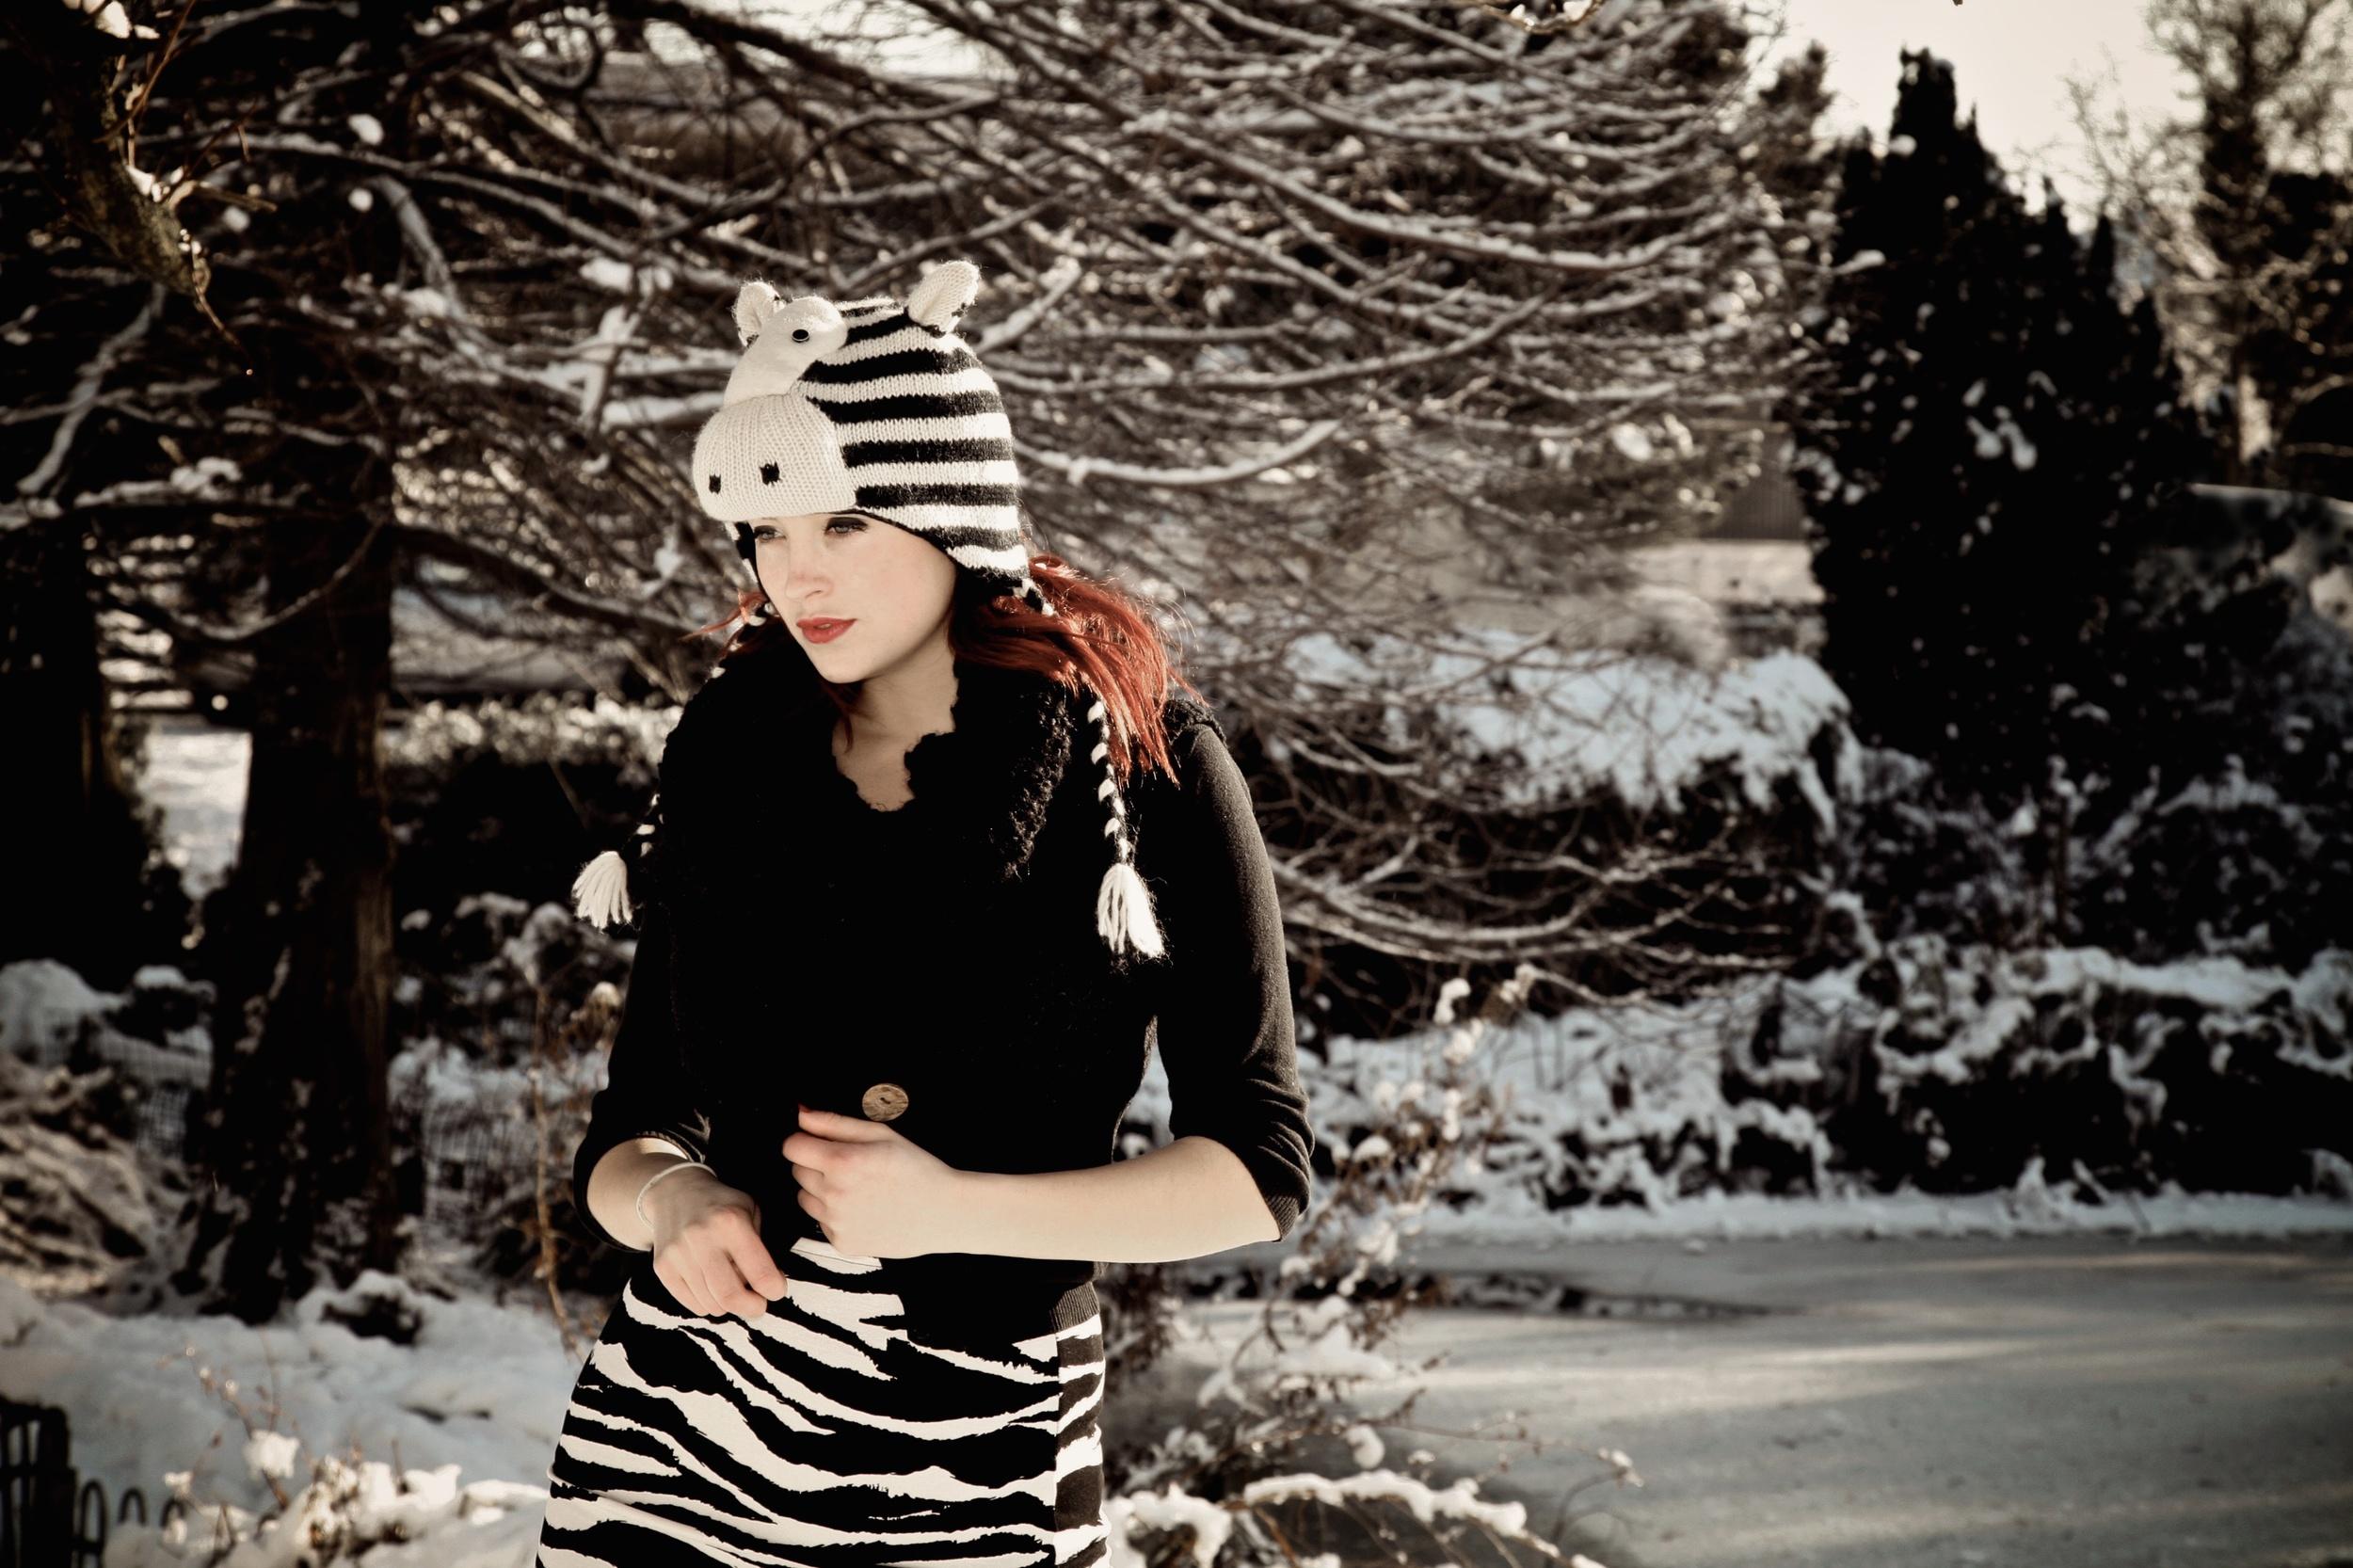 Wayne Hudson Photography, Lucria Creative, Cornwall and Devon photographer,  Launceston, photography / personal portrait / boudoir / art nude / Lucy Collet / Lucy Vixen/ portrait / Imagery by Hudson